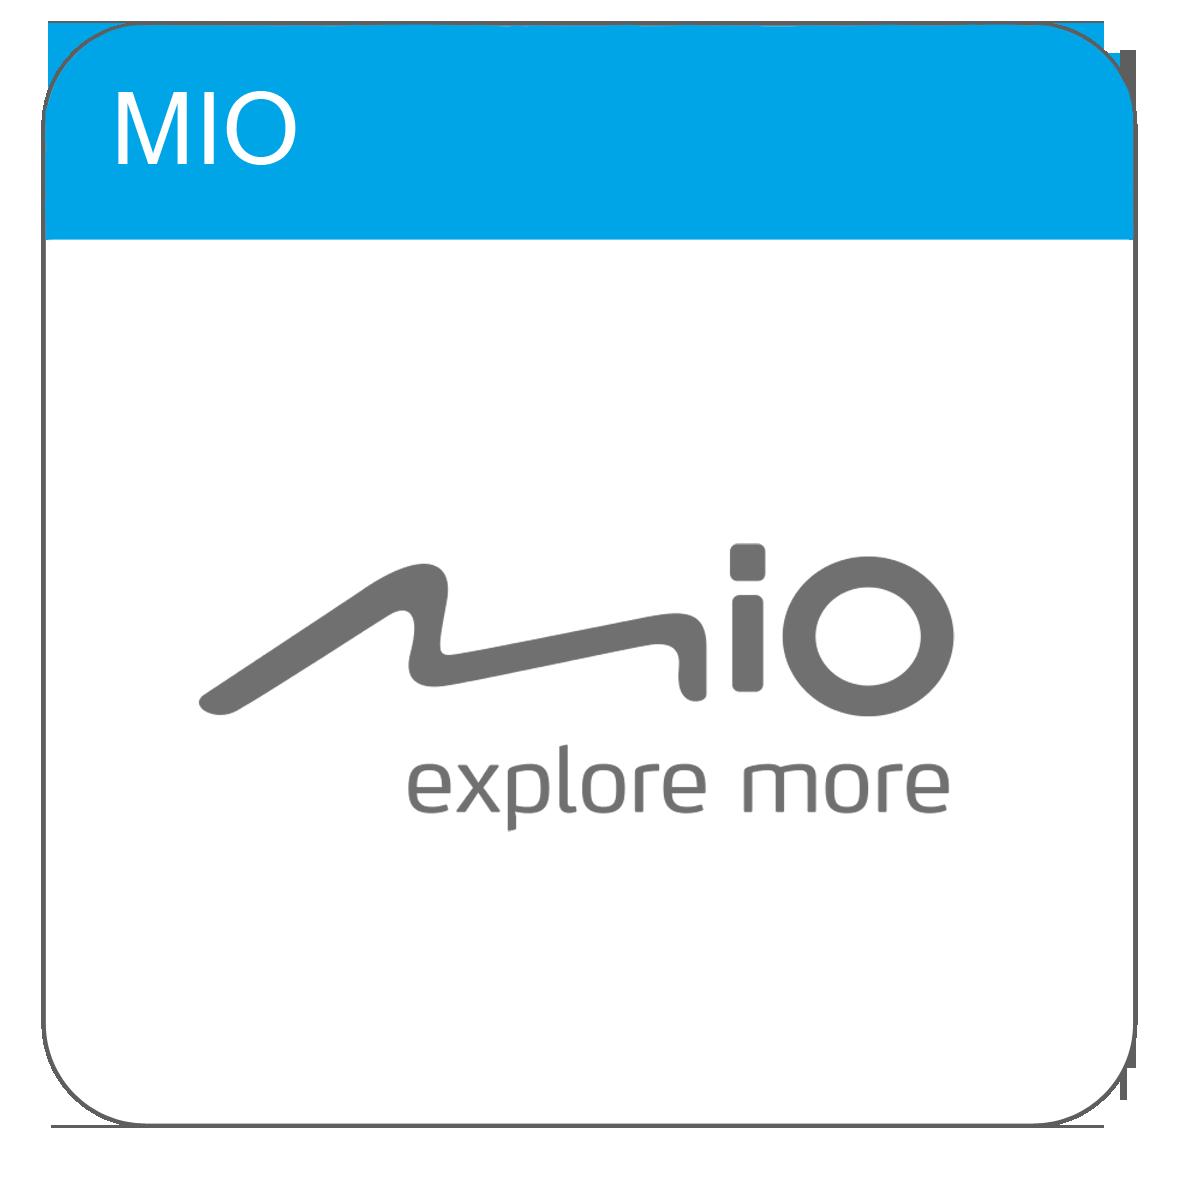 Mio Drivers & Handleidingen